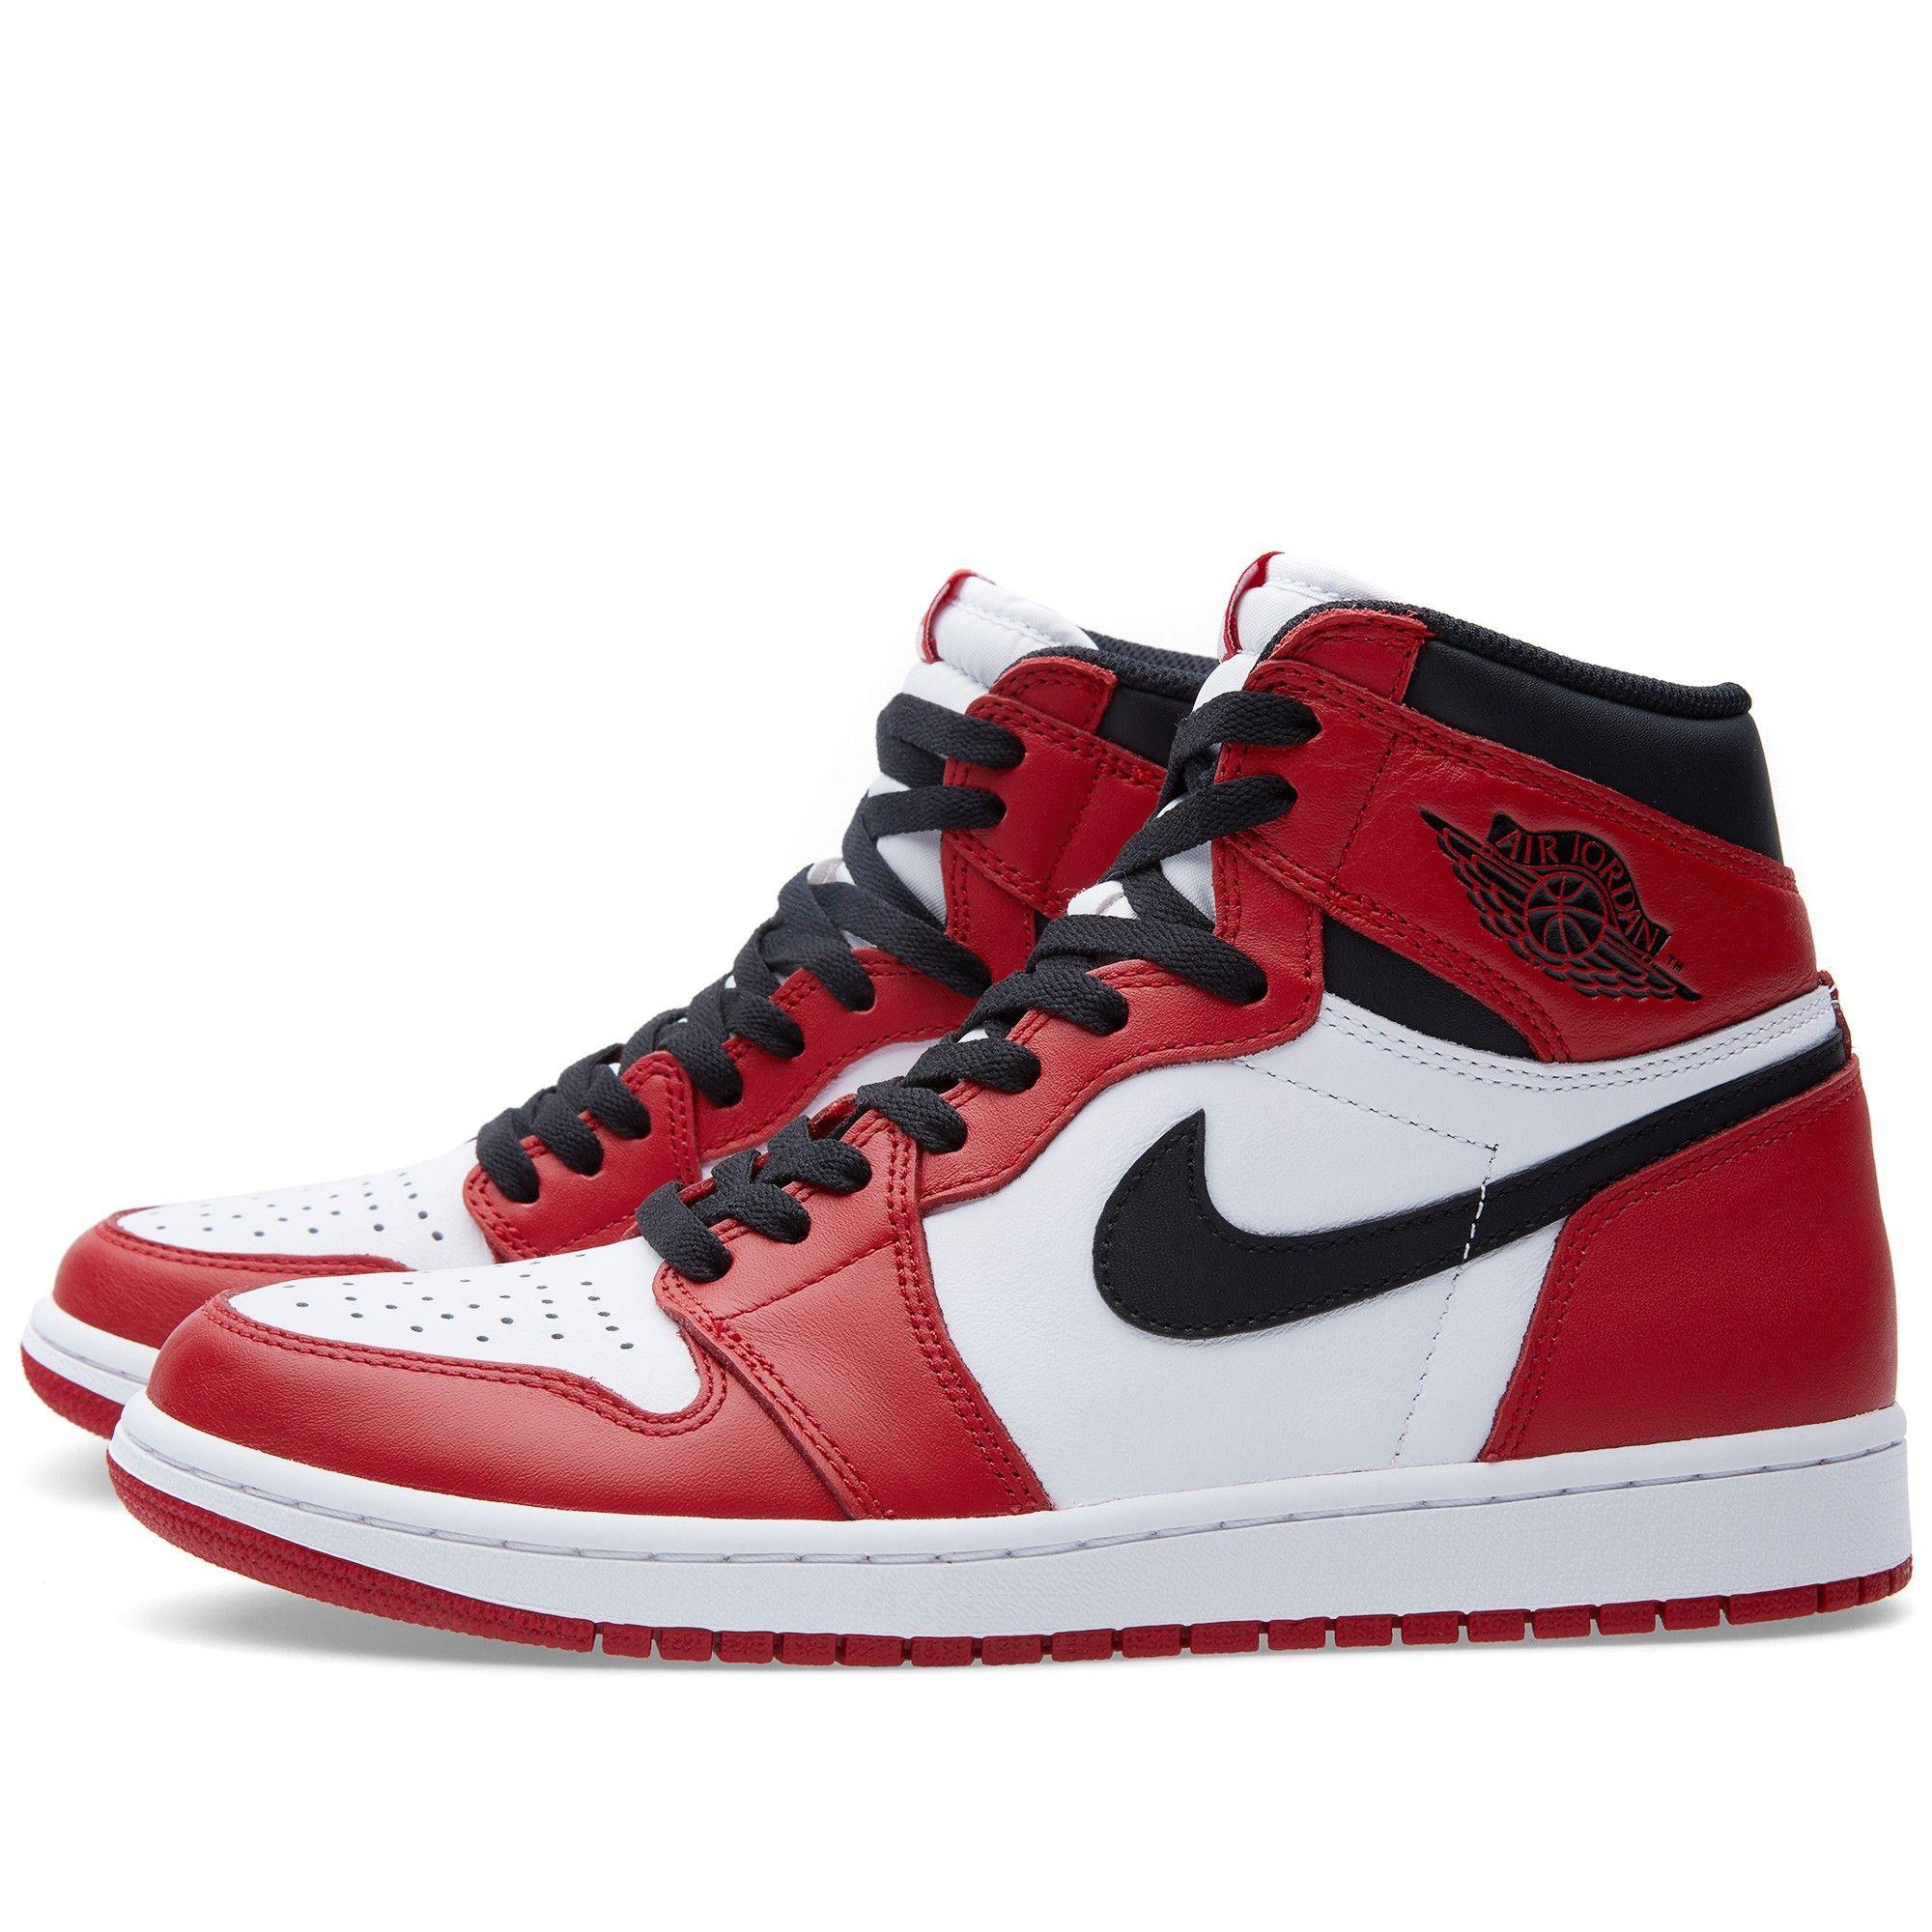 Nike Air Jordan 1 Retro High Og Varsity Red With Images Air